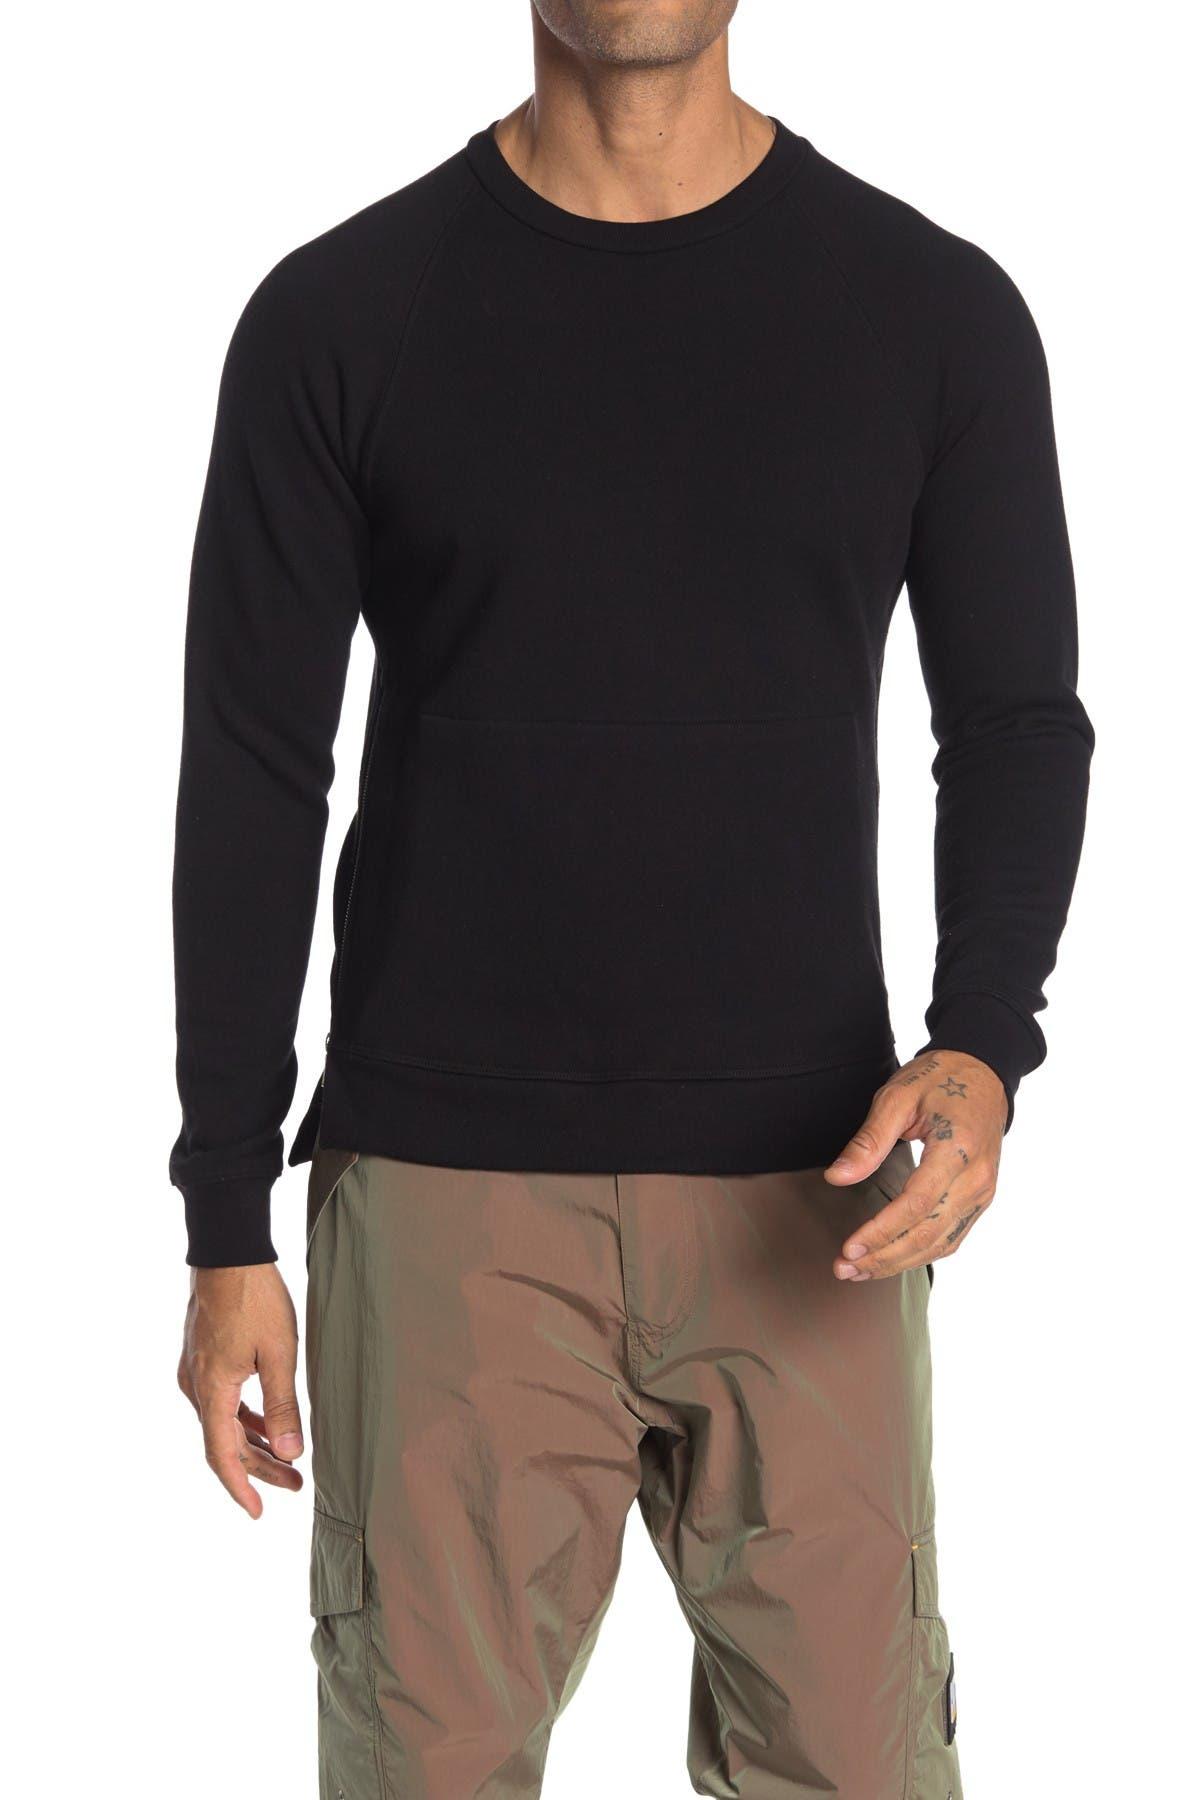 Image of John Elliott Hooded Villain Sweatshirt